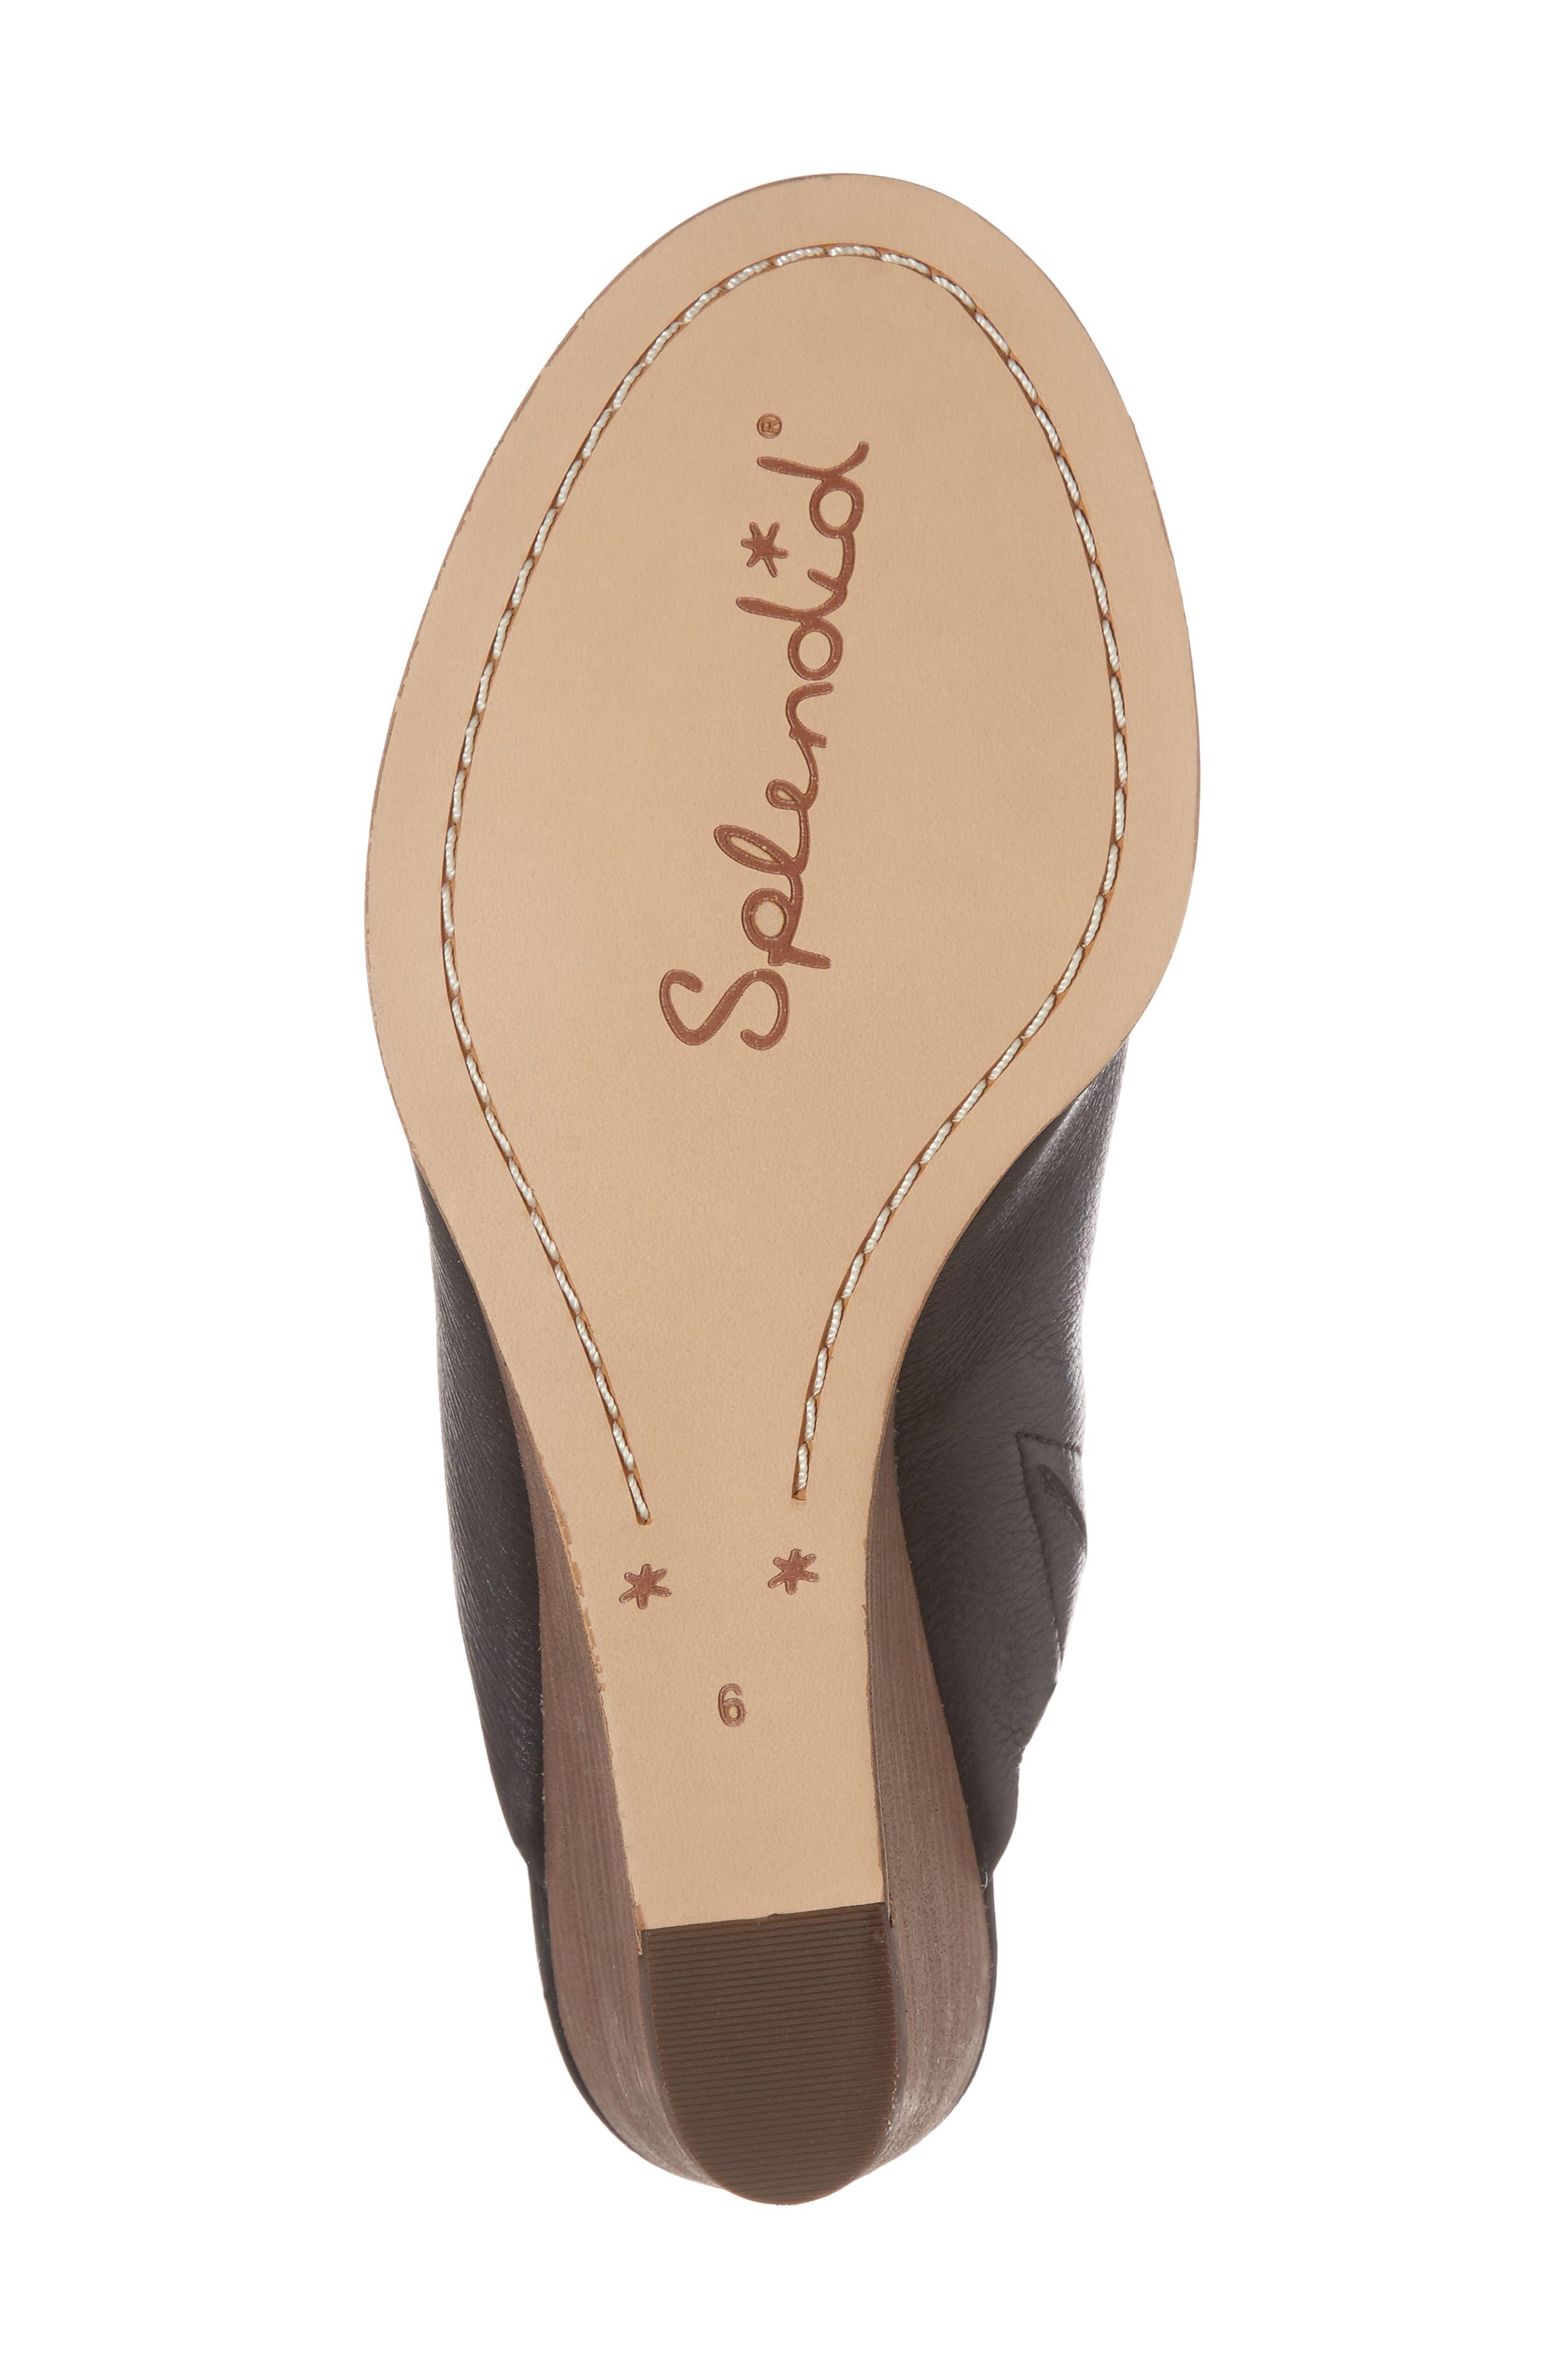 Fenwick Wedge Sandal,                             Alternate thumbnail 6, color,                             Black Leather